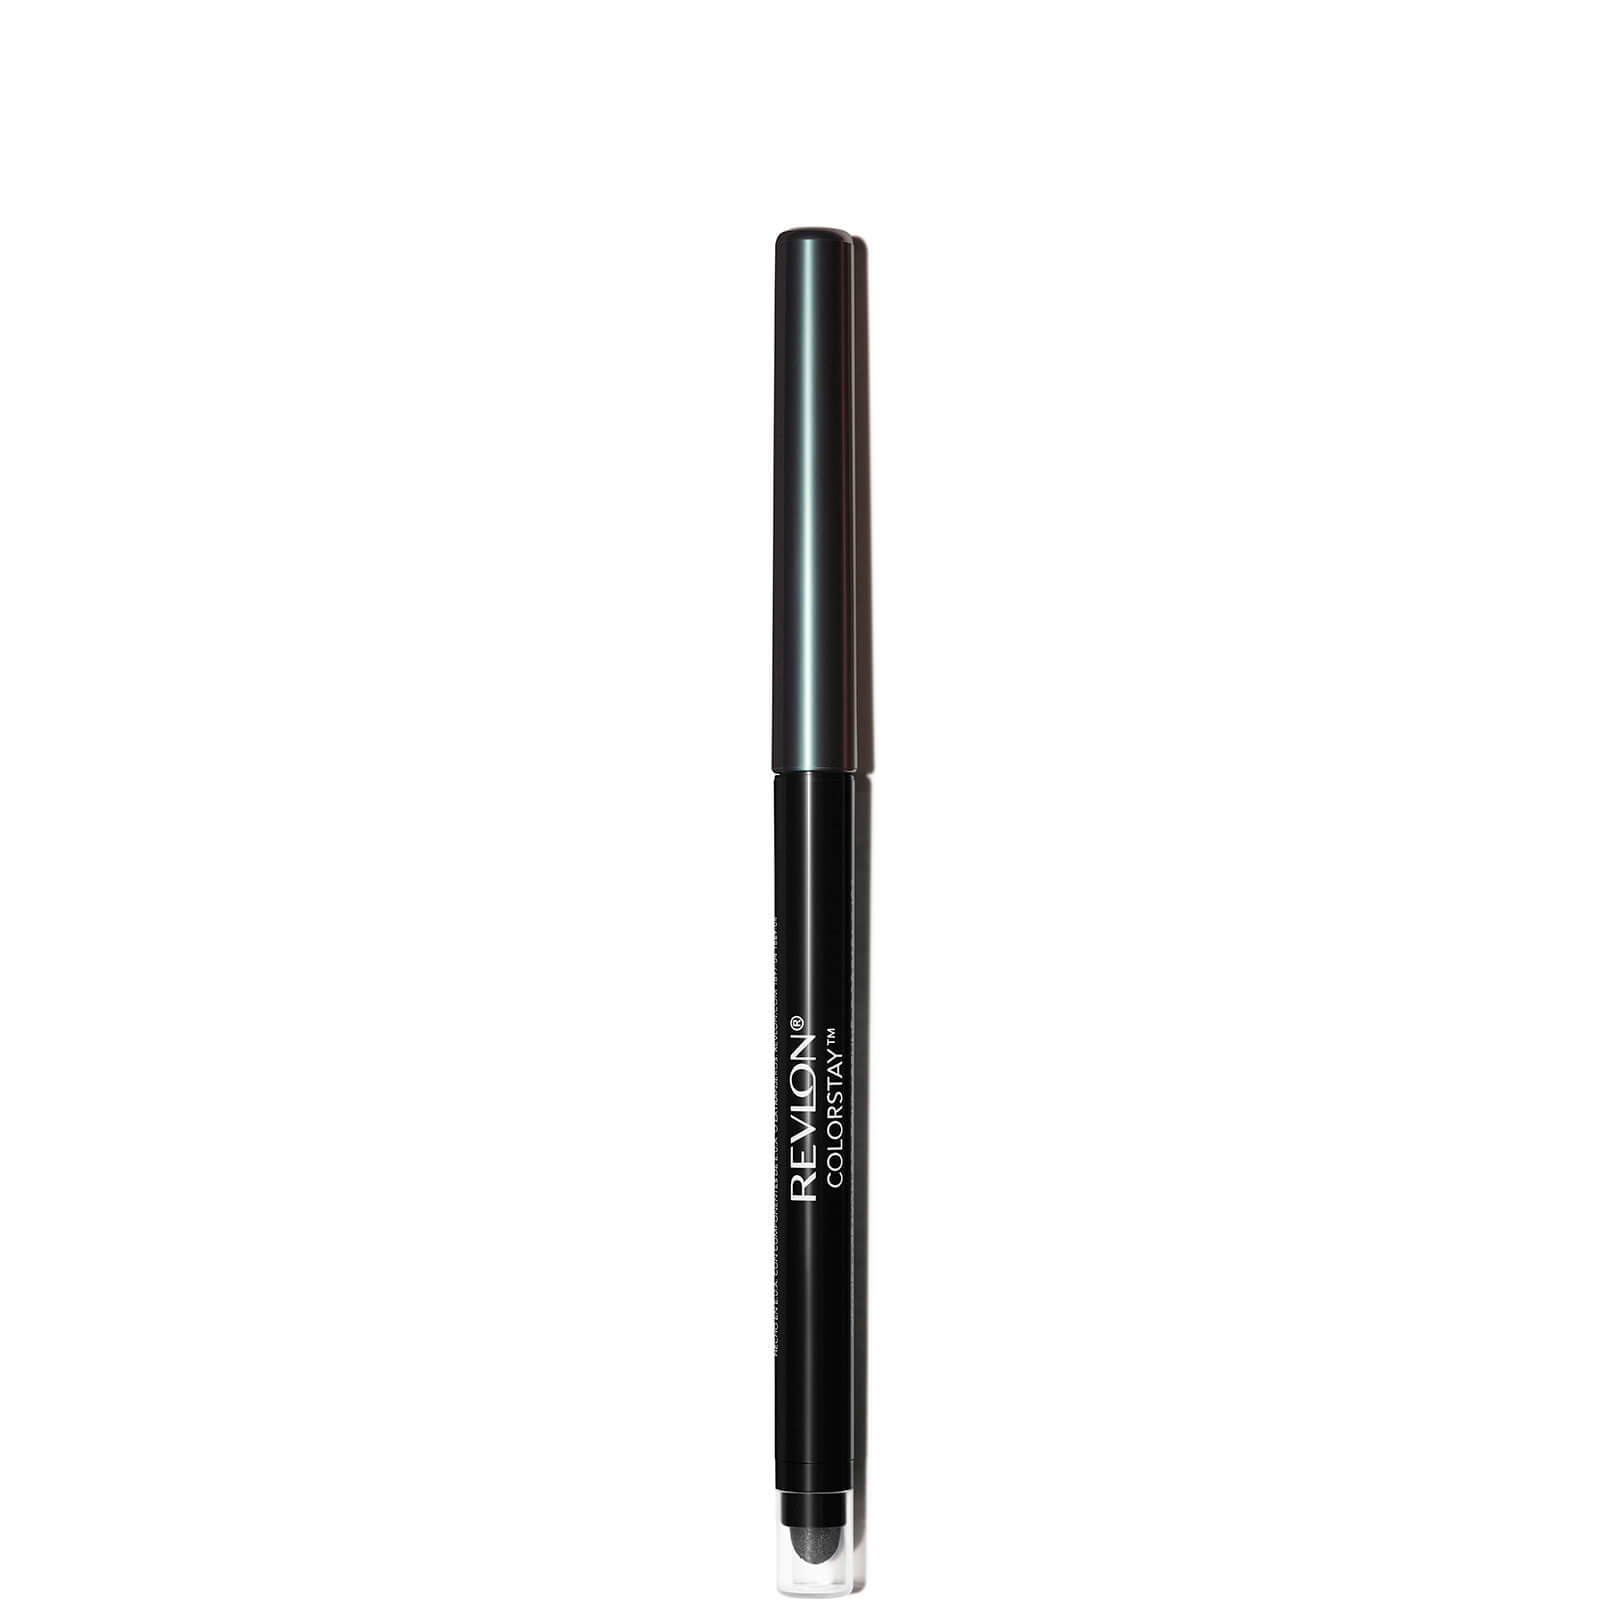 Купить Revlon ColorStay Eyeliner Pencil 1.67g (Various Shades) - Sparkling Black